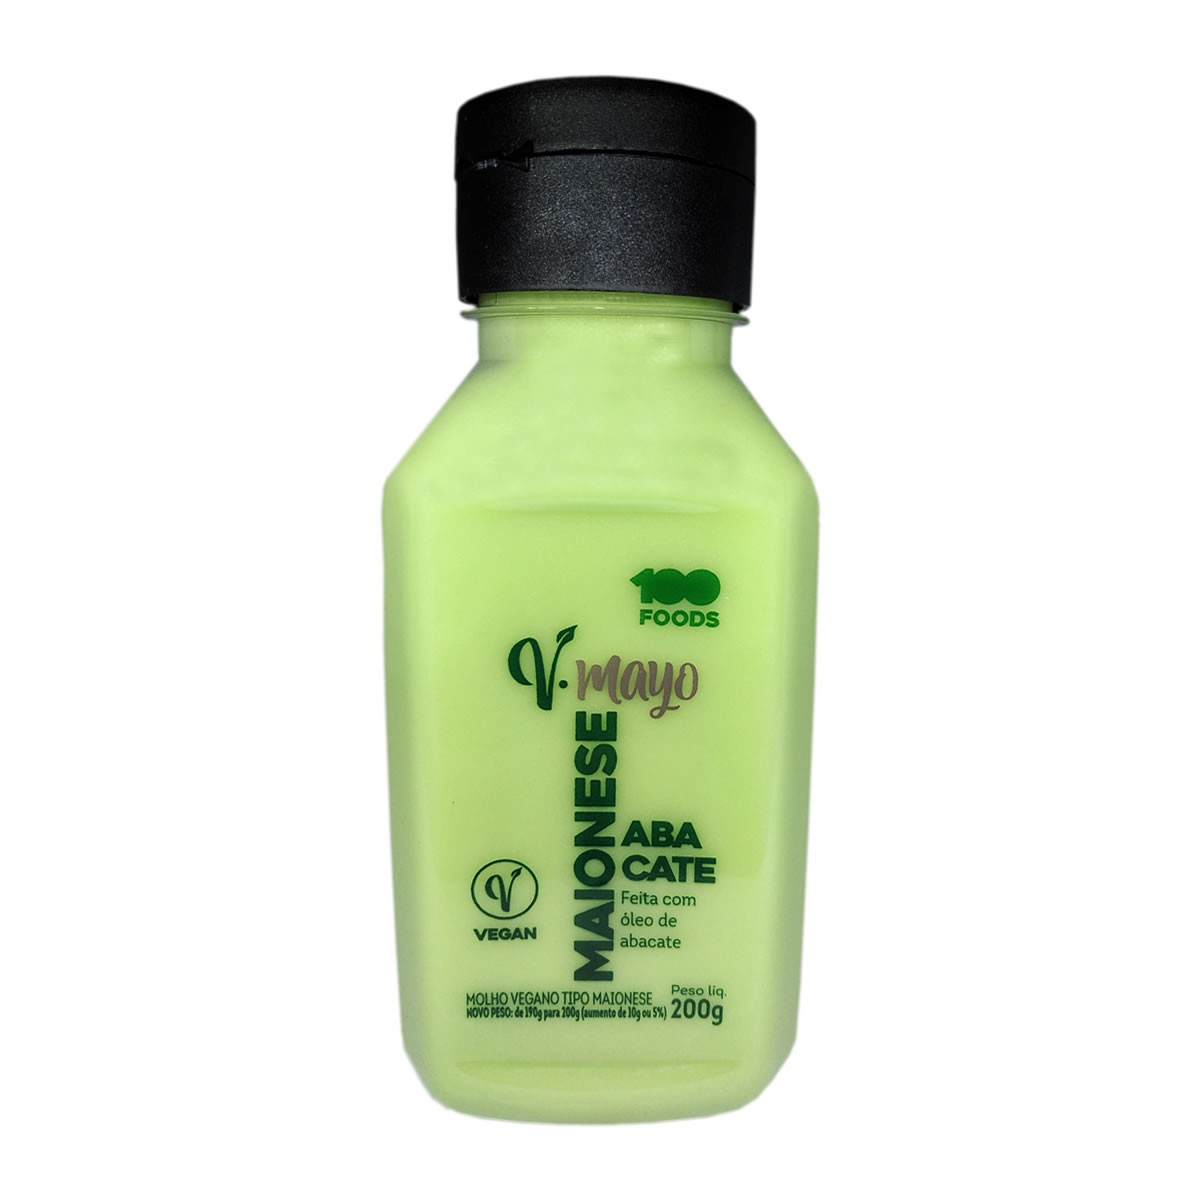 Maionese Vegana de Abacate 200g - 100 Foods